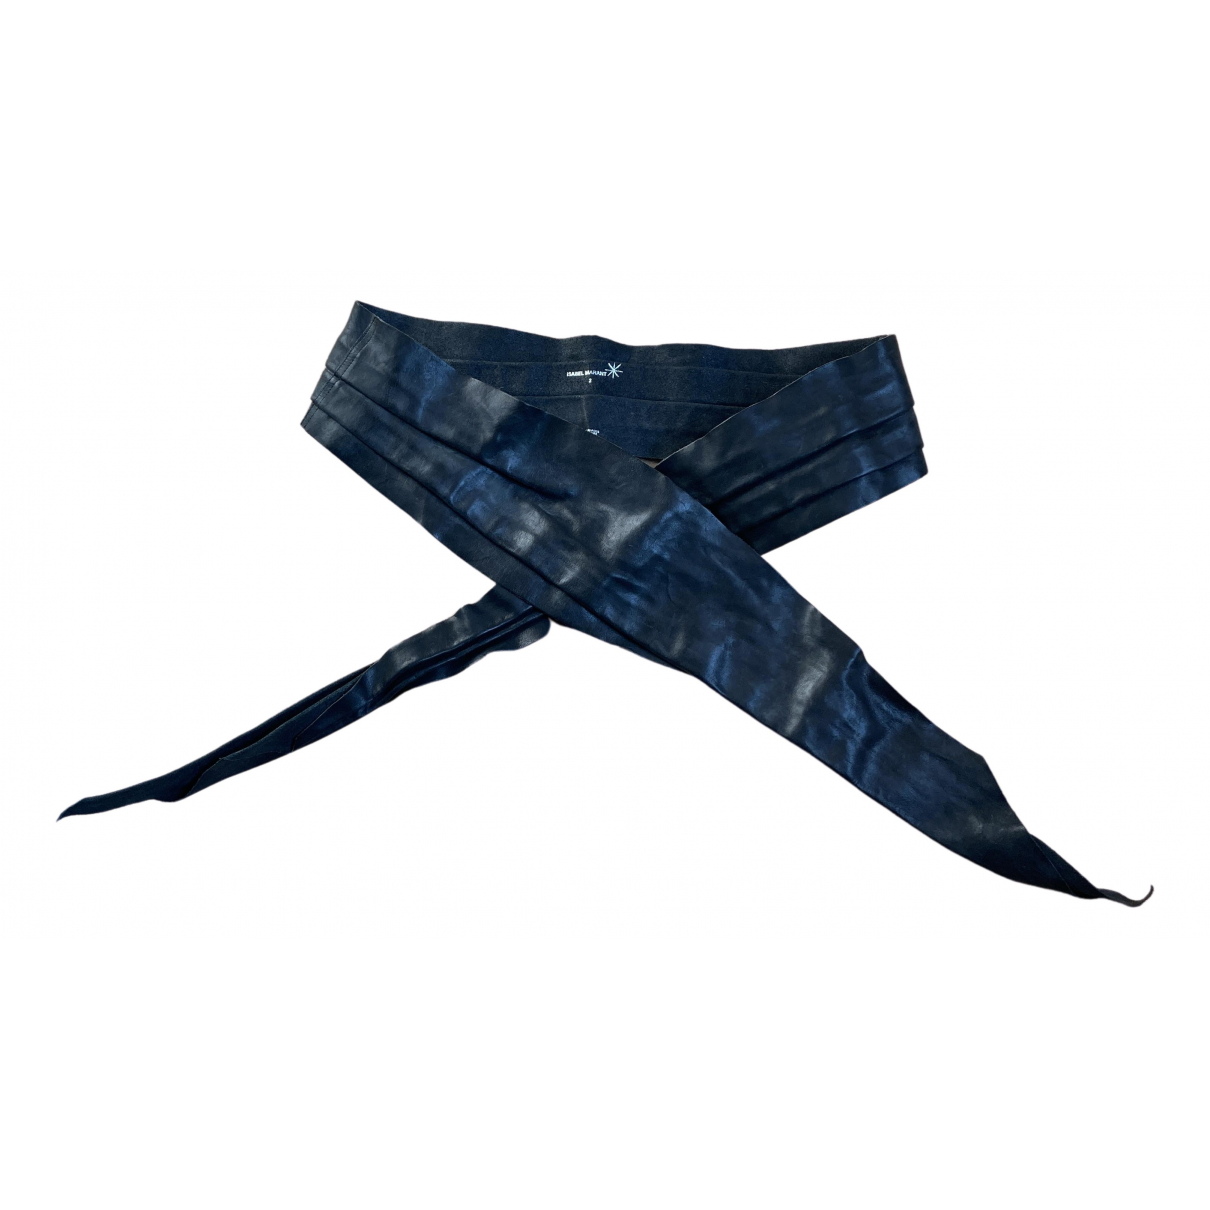 Isabel Marant N Black Leather belt for Women S International